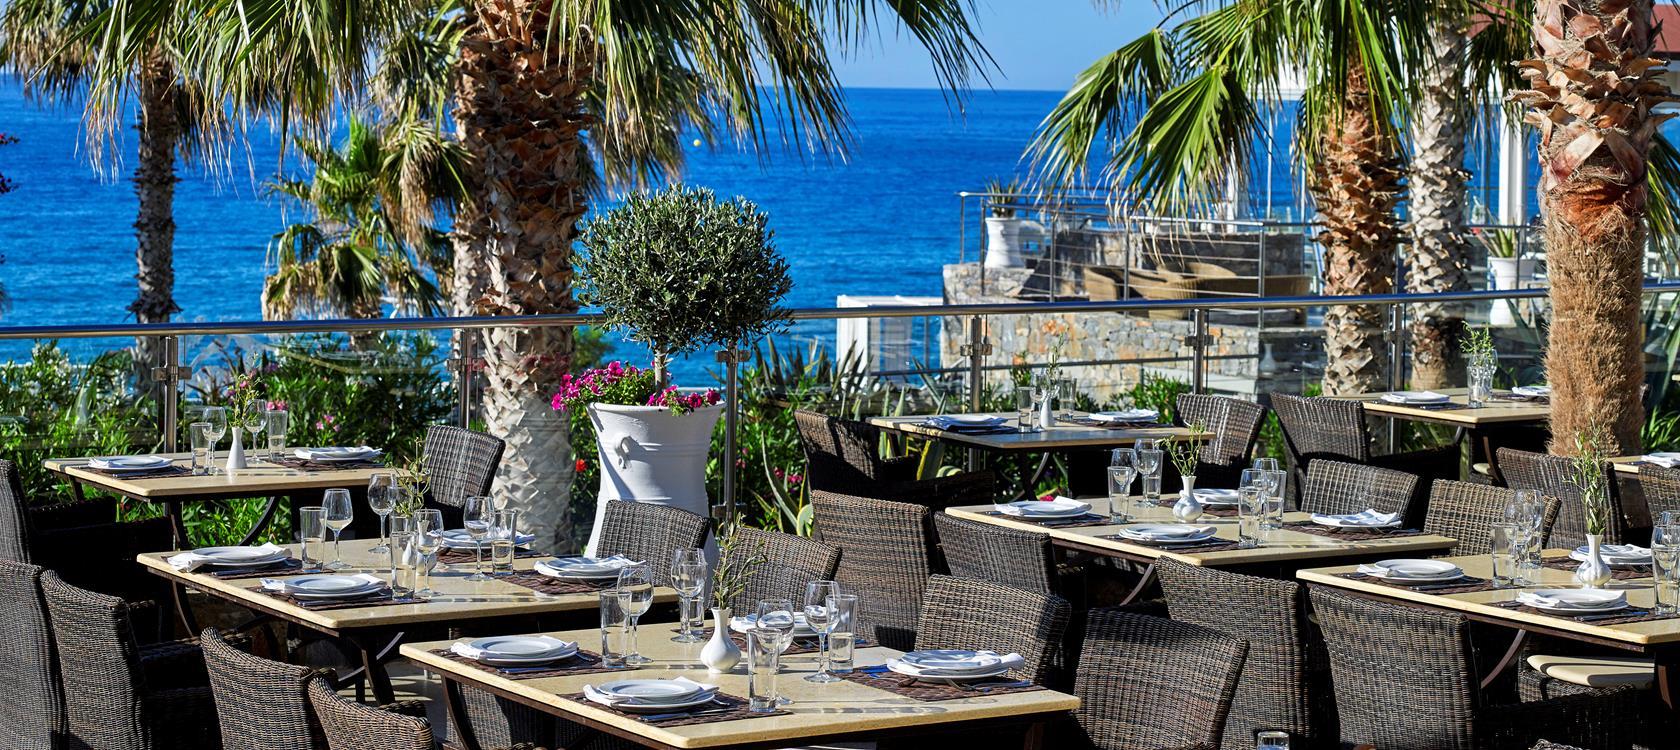 restaurant bars in luxury resort ikaros beach travel. Black Bedroom Furniture Sets. Home Design Ideas